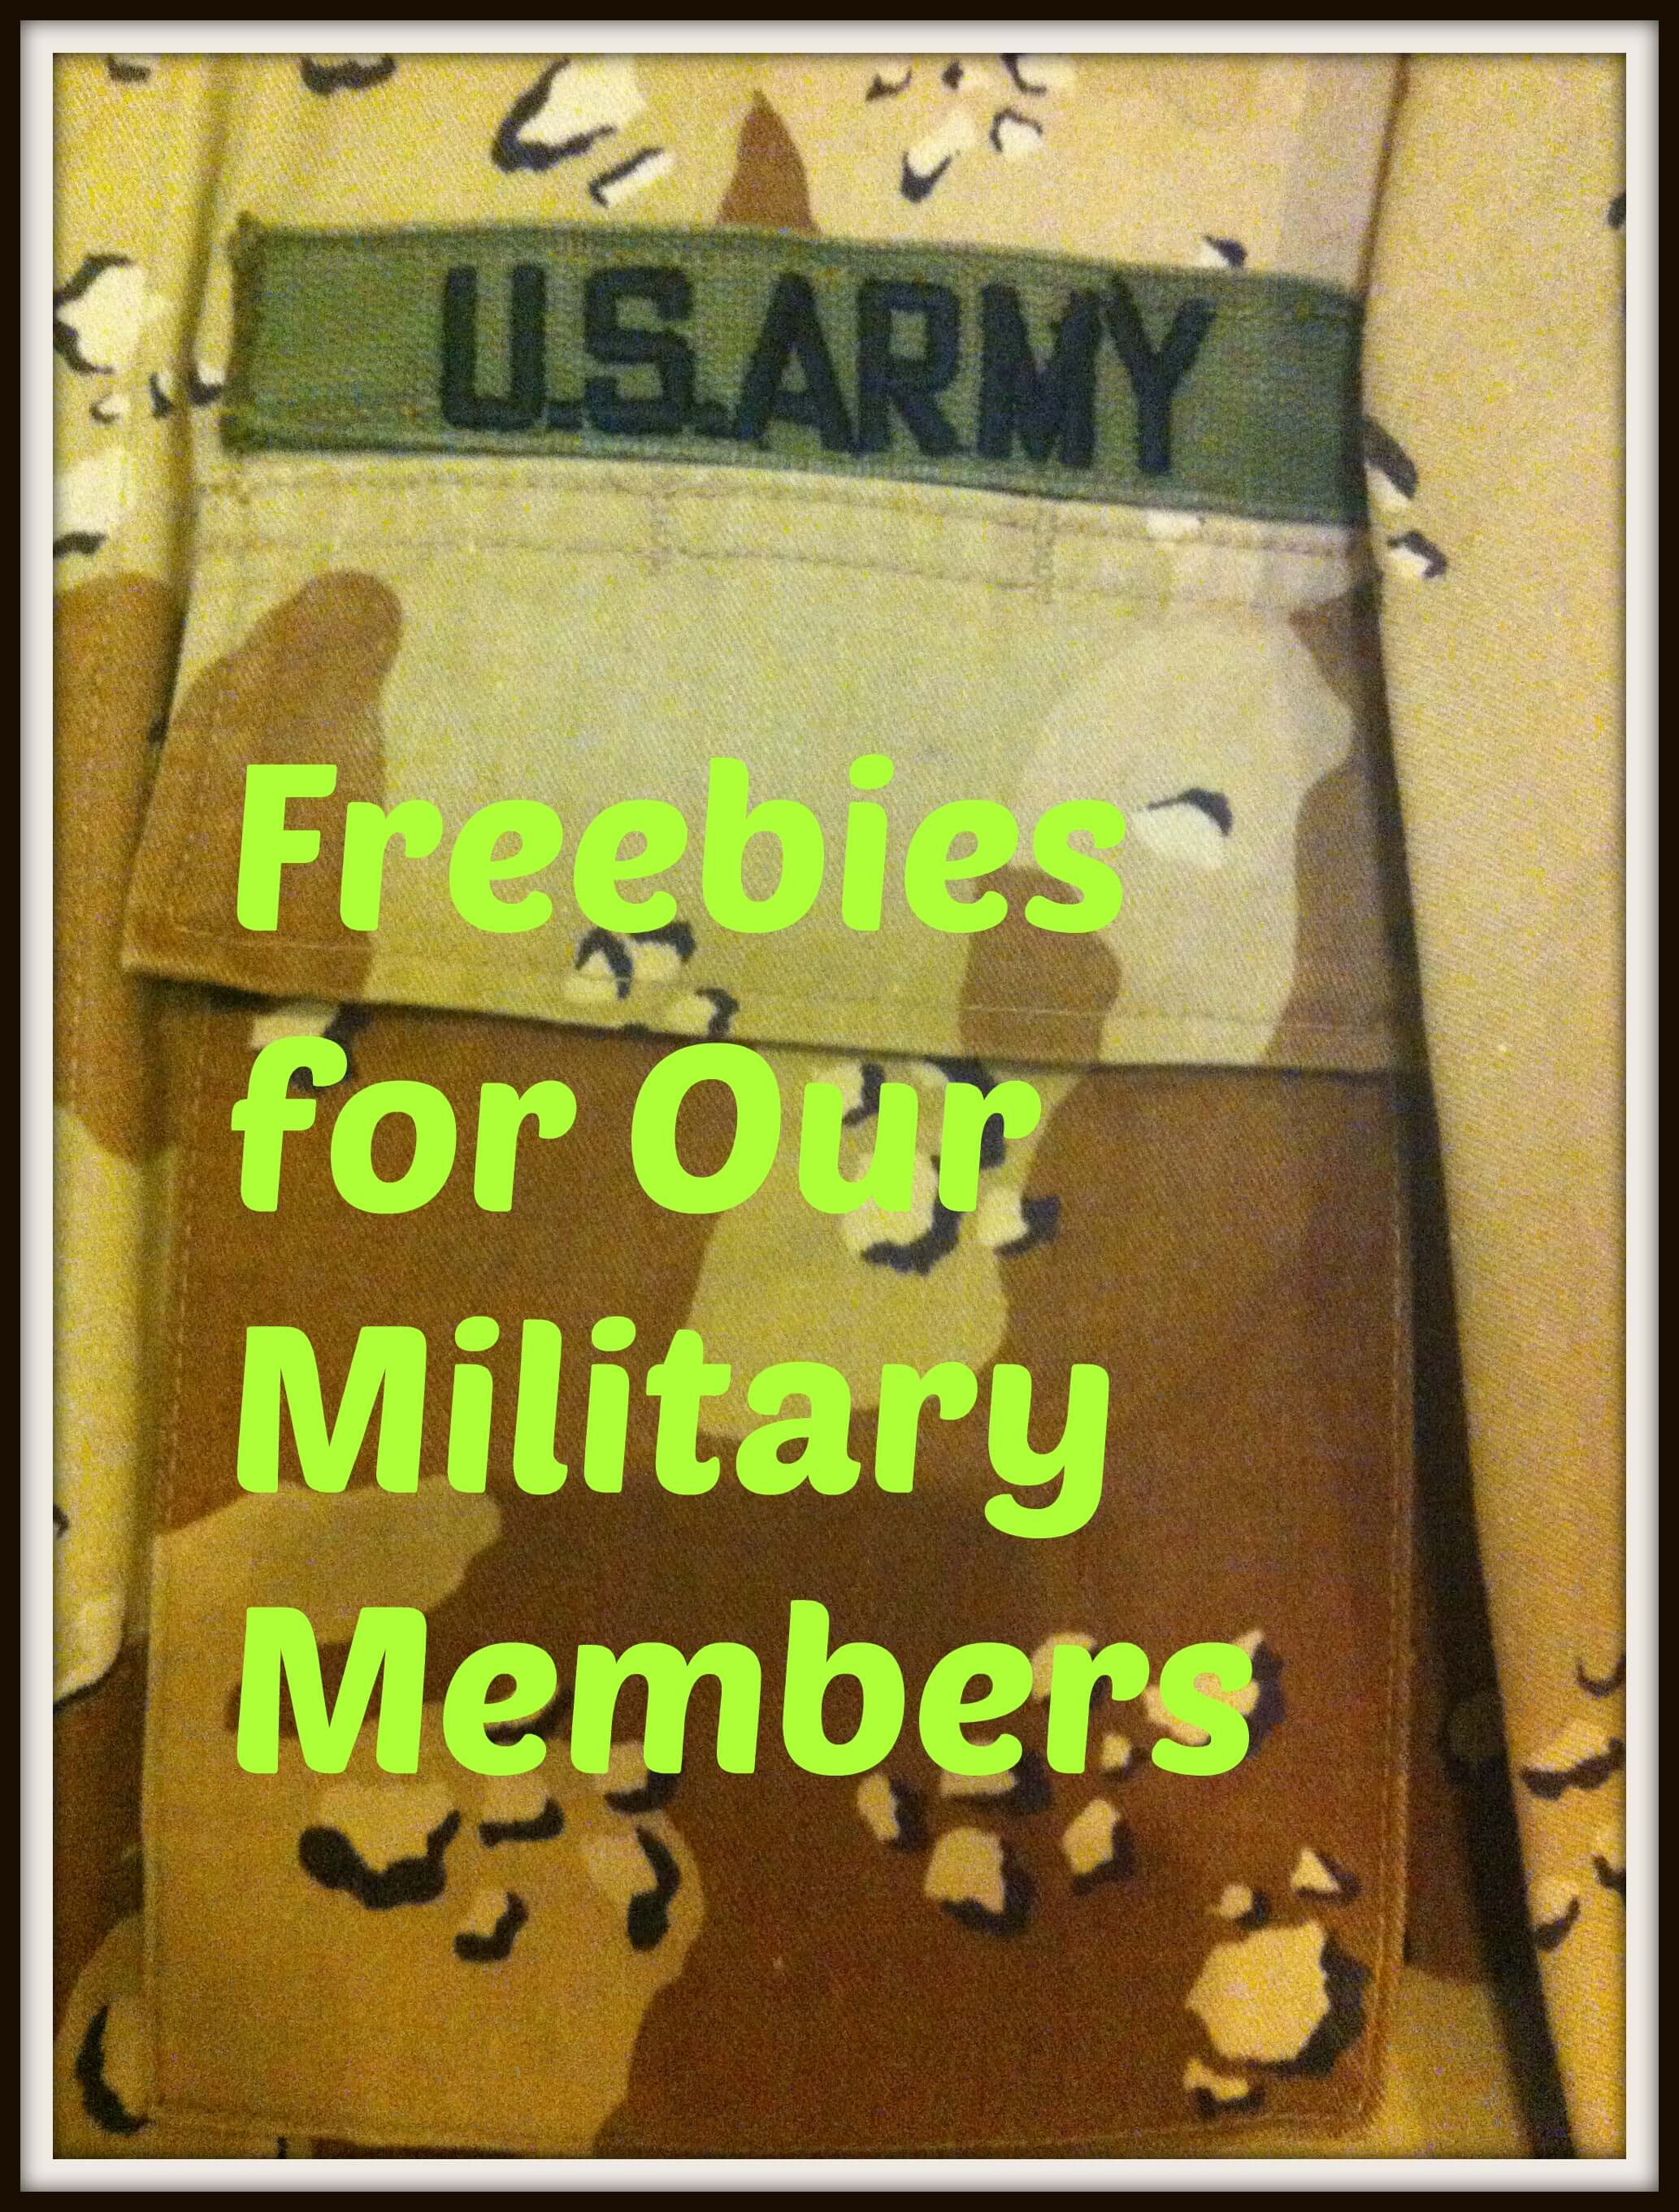 Military freebies